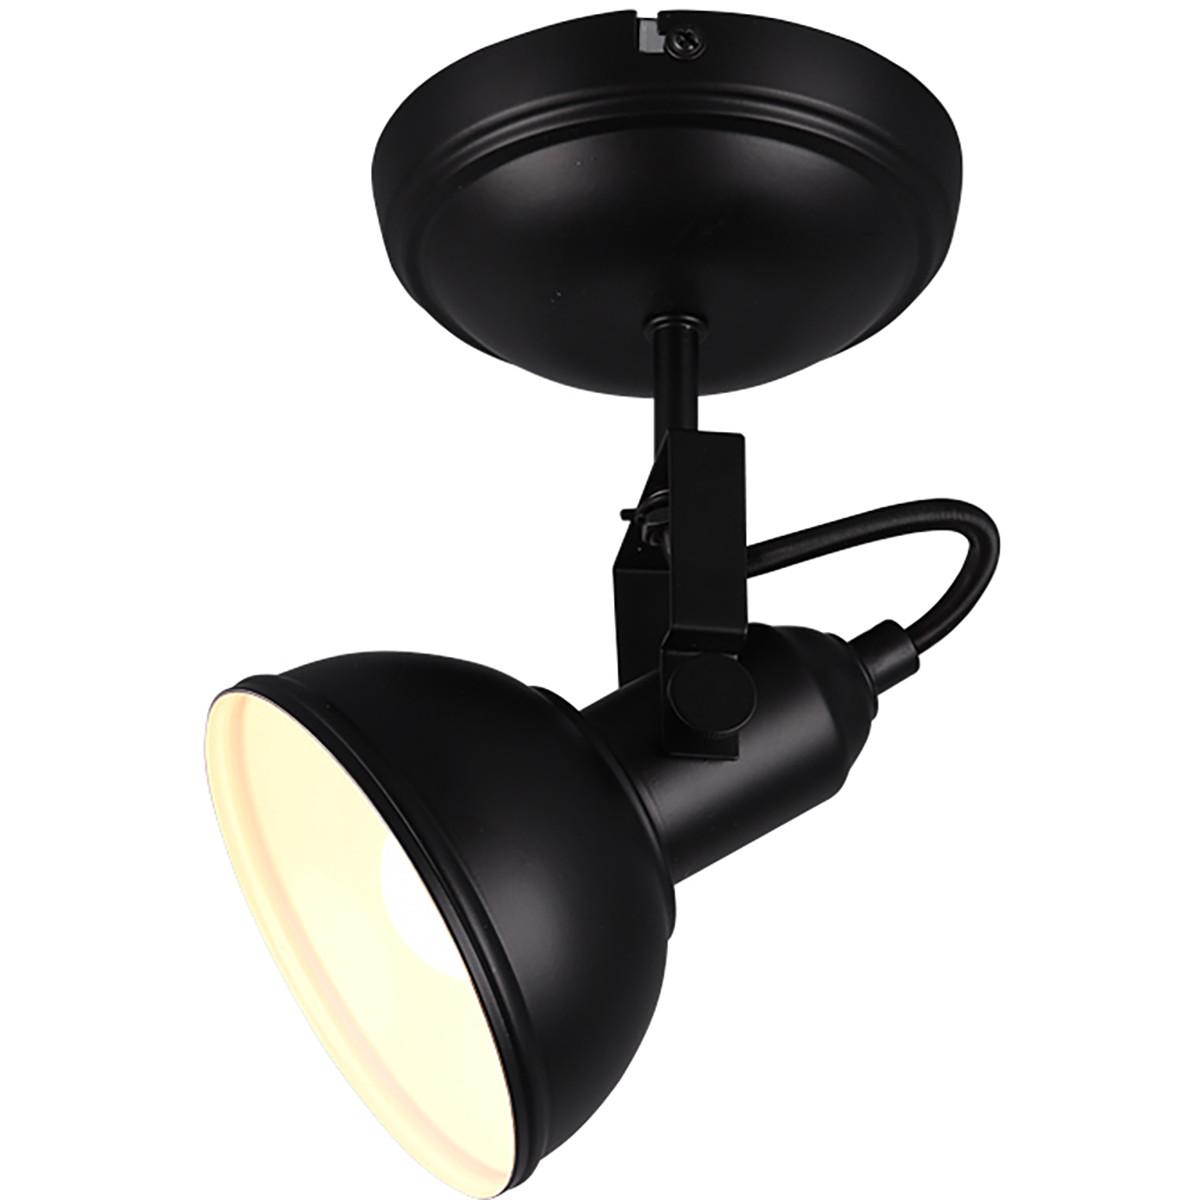 LED Plafondspot - Trion Gini - E14 Fitting - 1-lichts - Rond - Mat Zwart - Aluminium